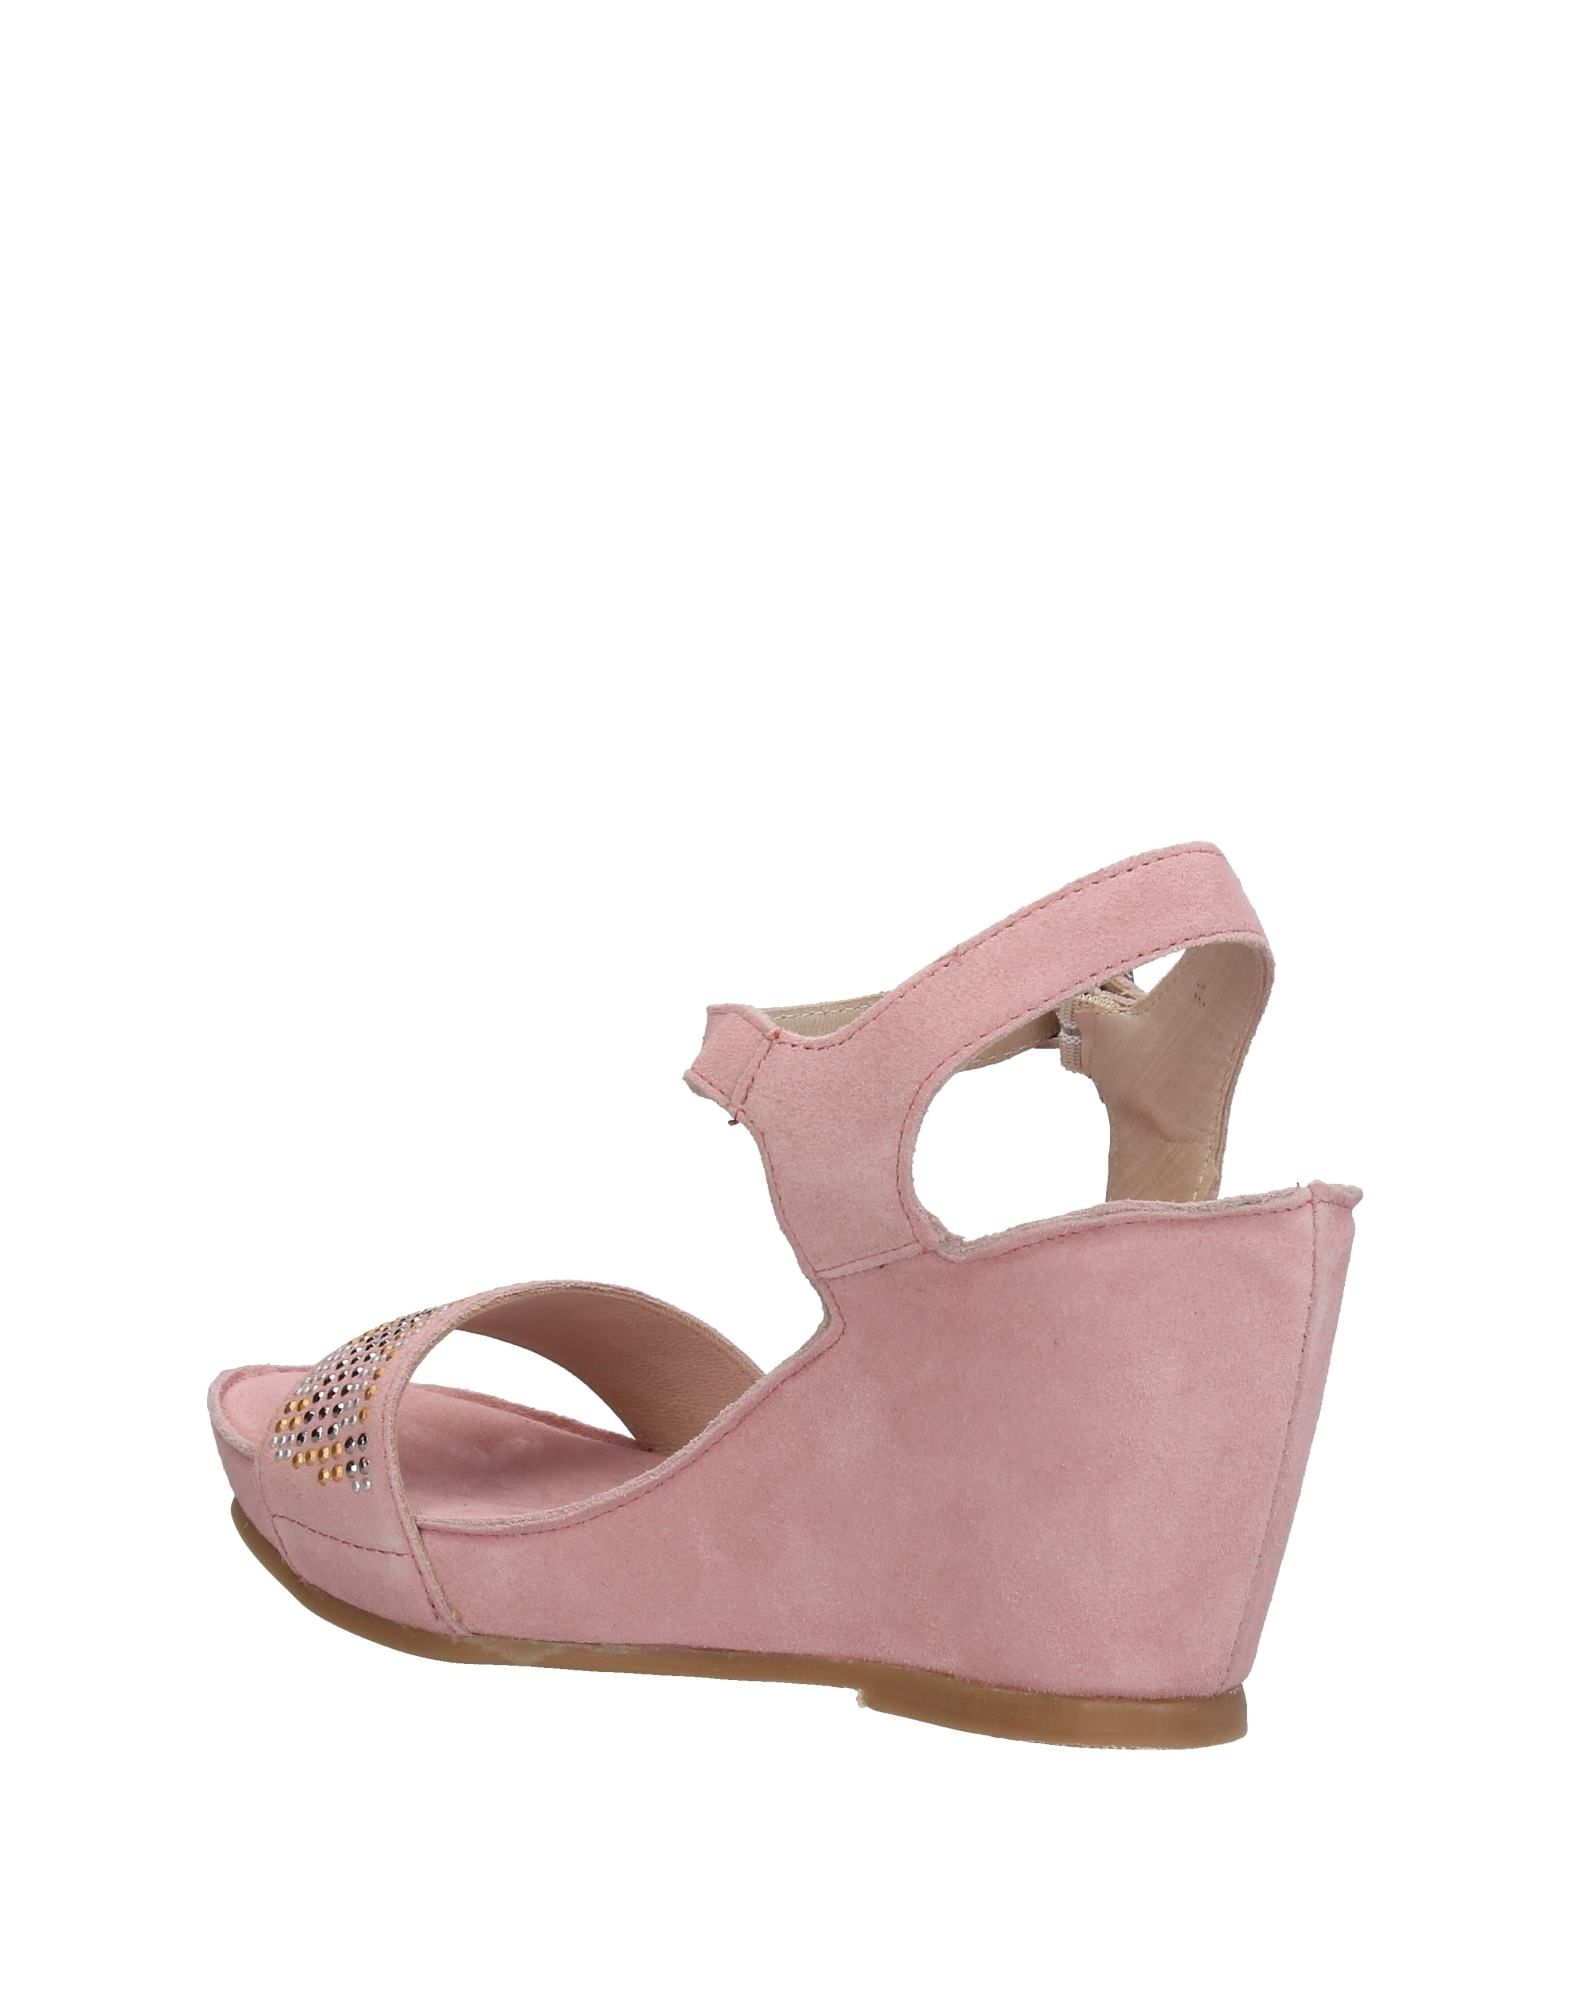 Khrio' Sandalen Damen  11409182GI Gute Qualität beliebte Schuhe